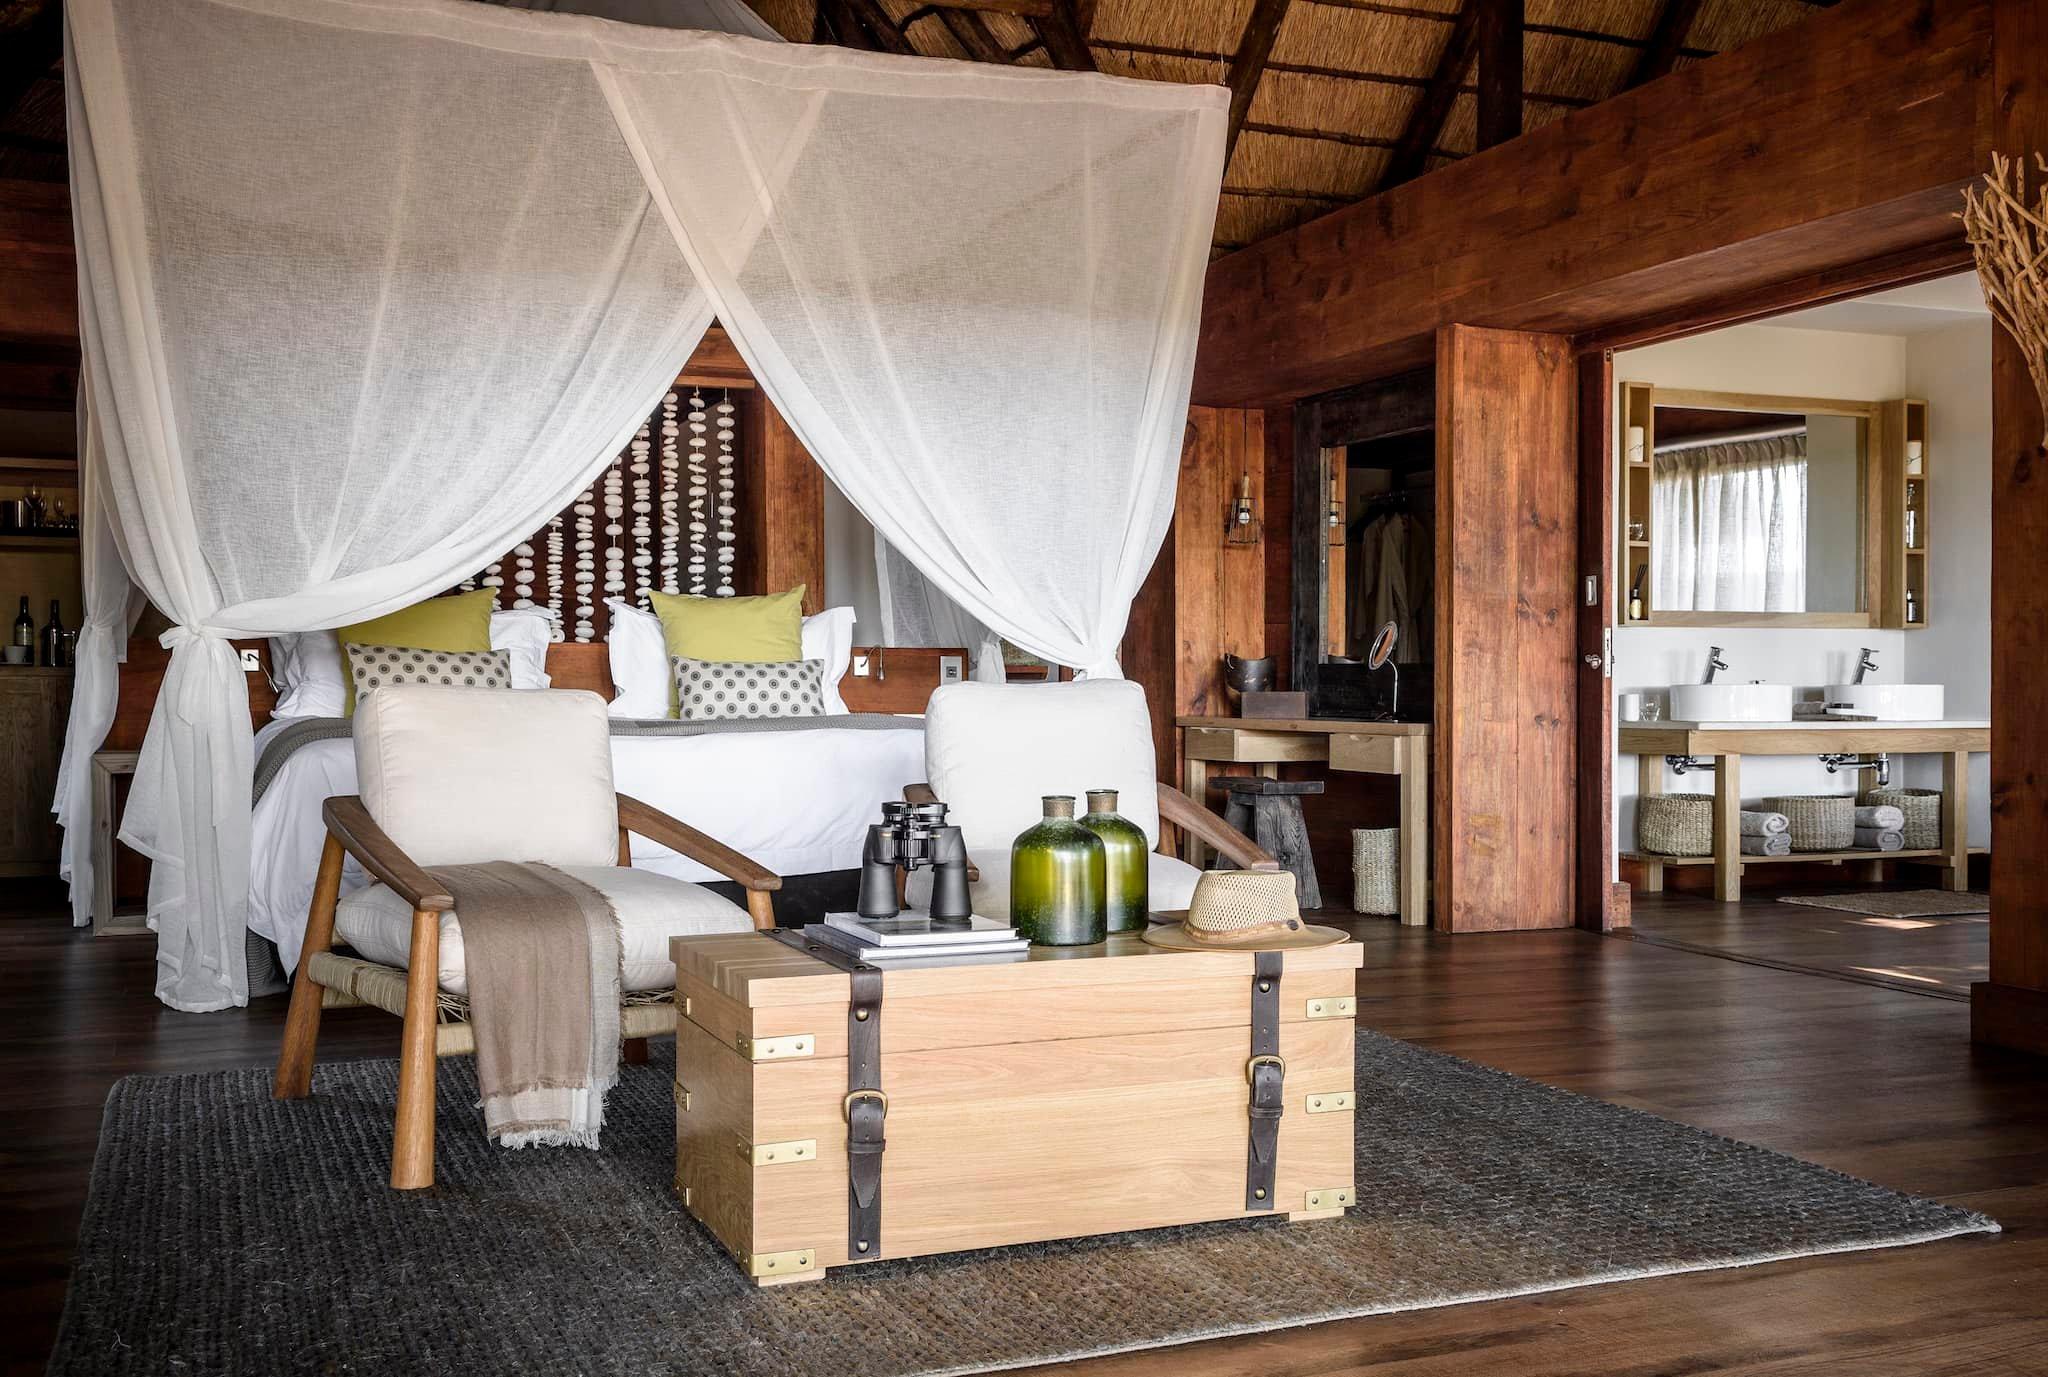 Sanctuary Chief's Camp - Botswana - The Indiana Travel Experiences